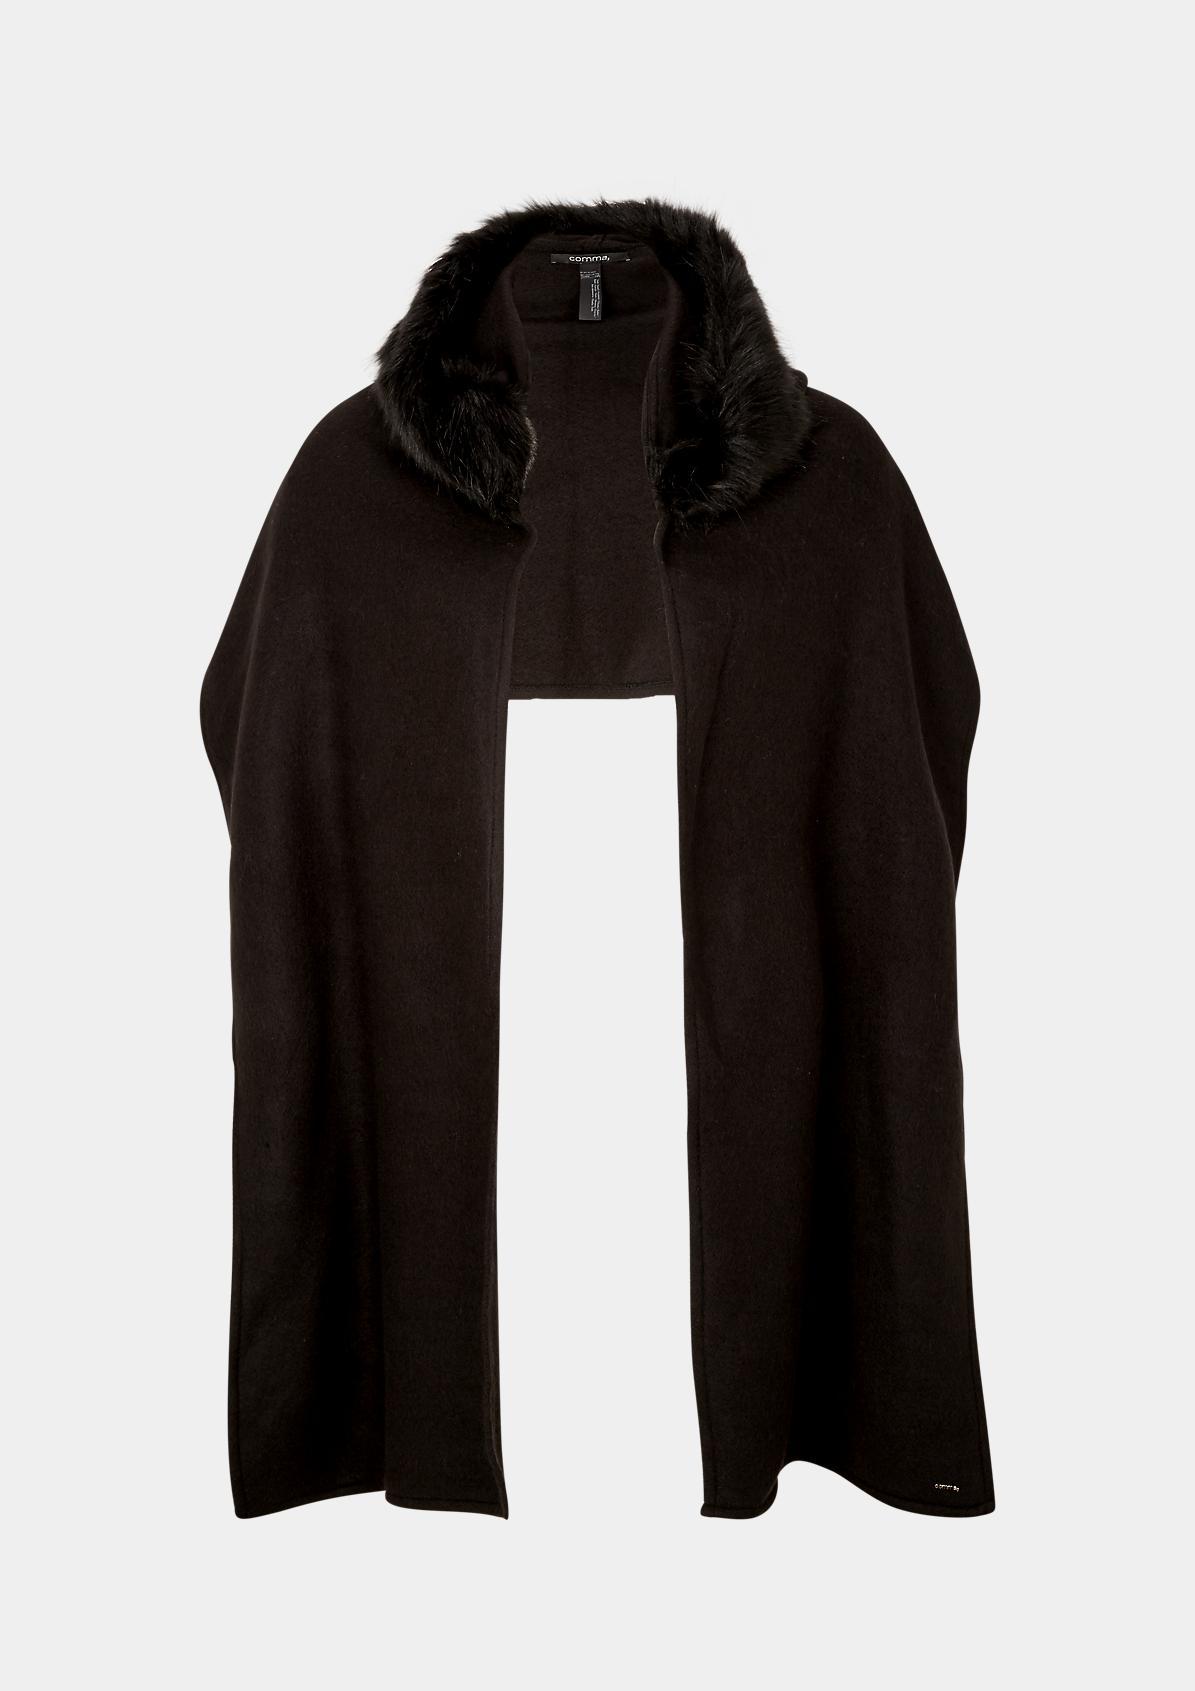 Schal mit kunstfellverzierter Kapuze